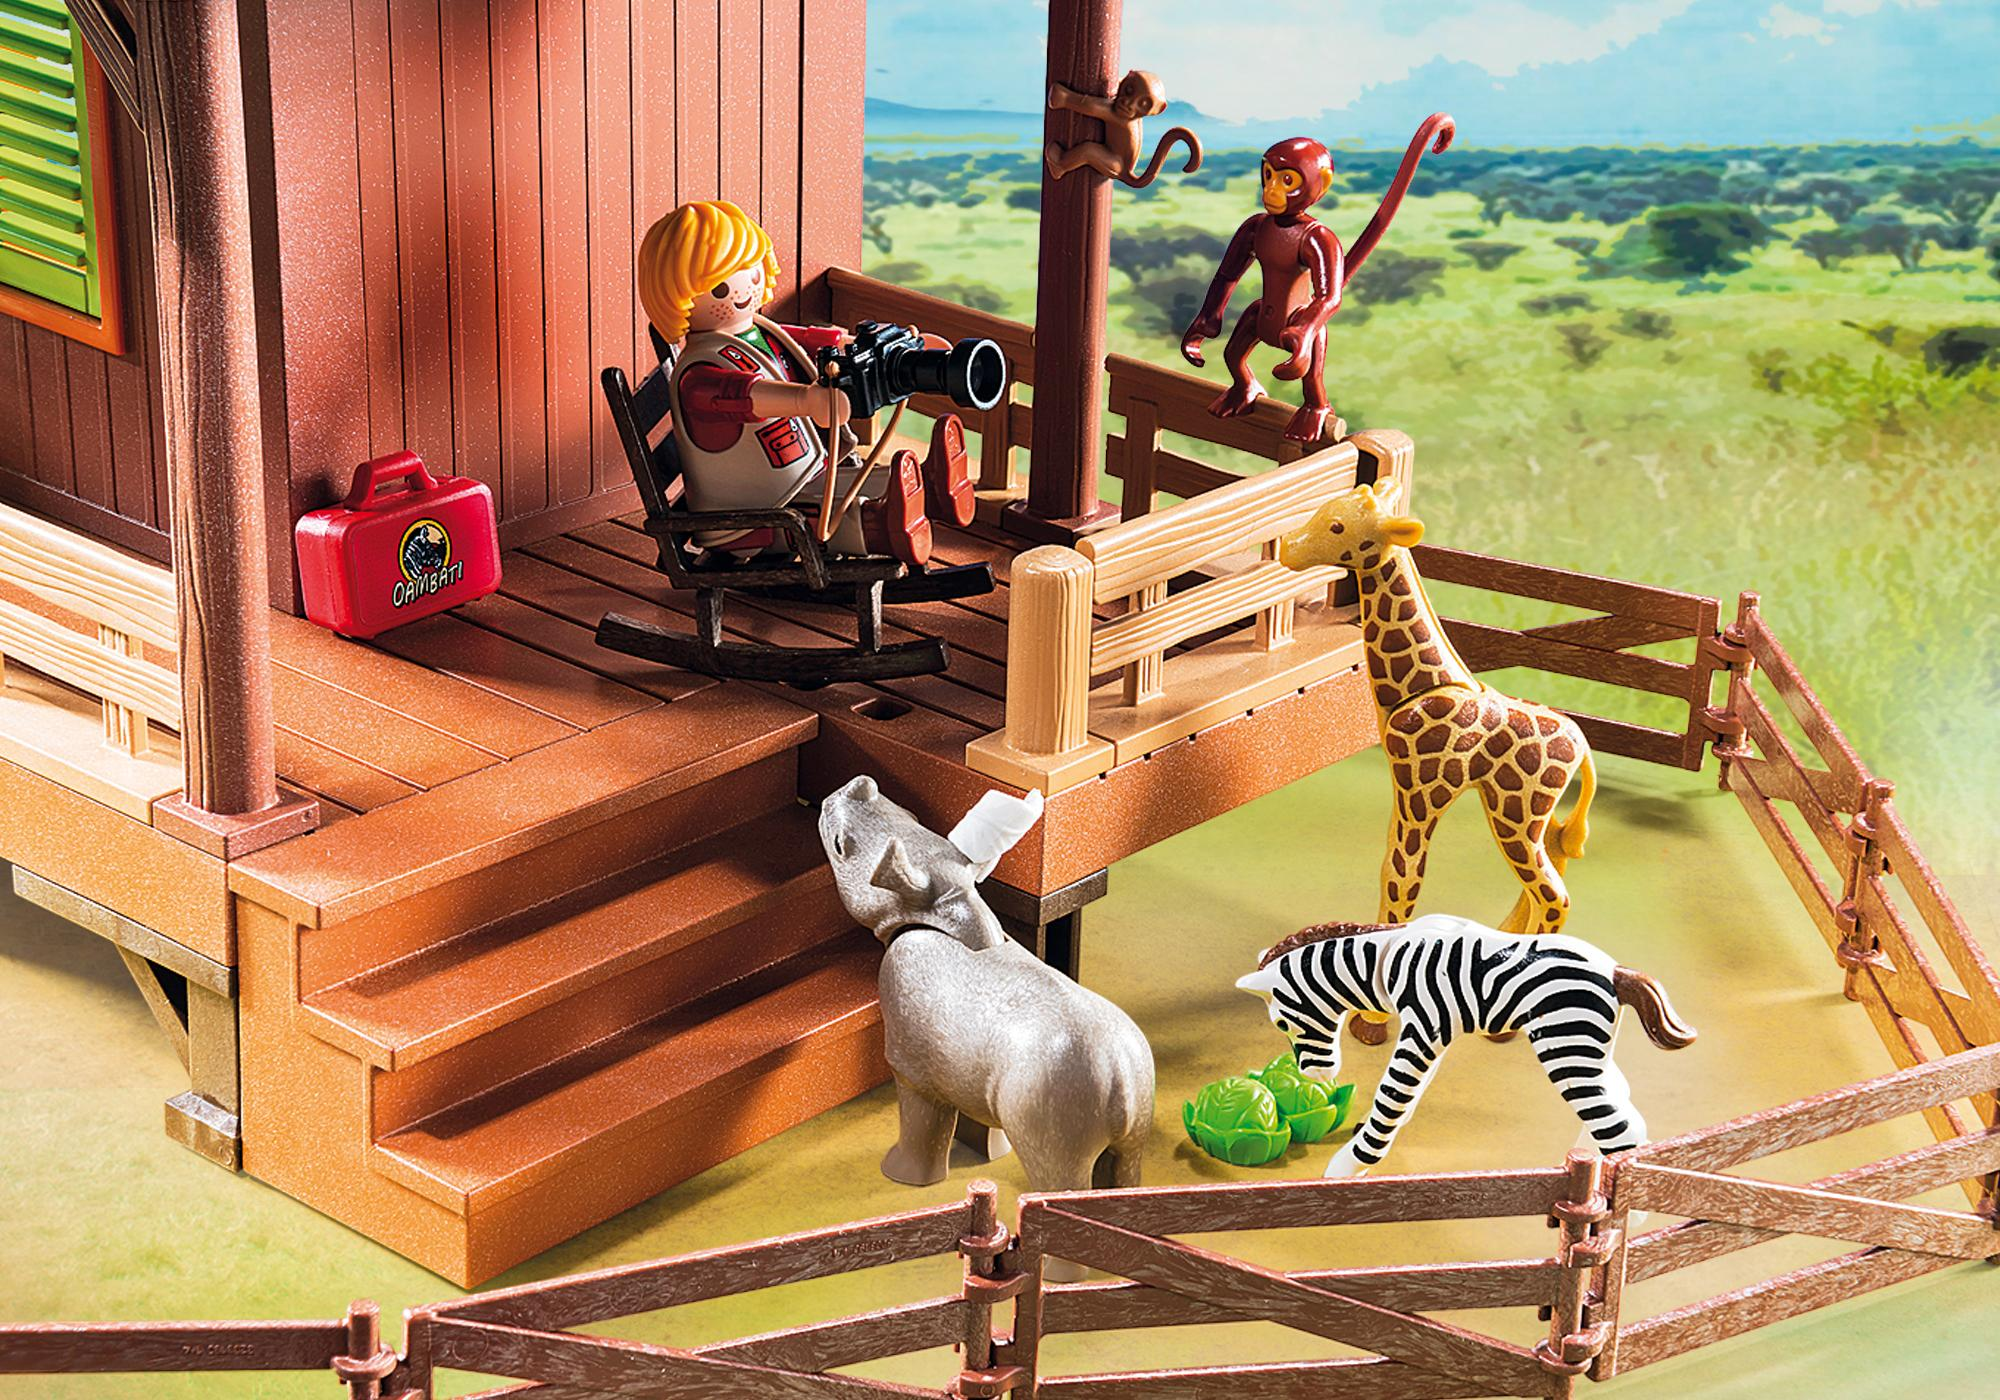 http://media.playmobil.com/i/playmobil/6936_product_extra3/Centre de soins pour animaux de la savane